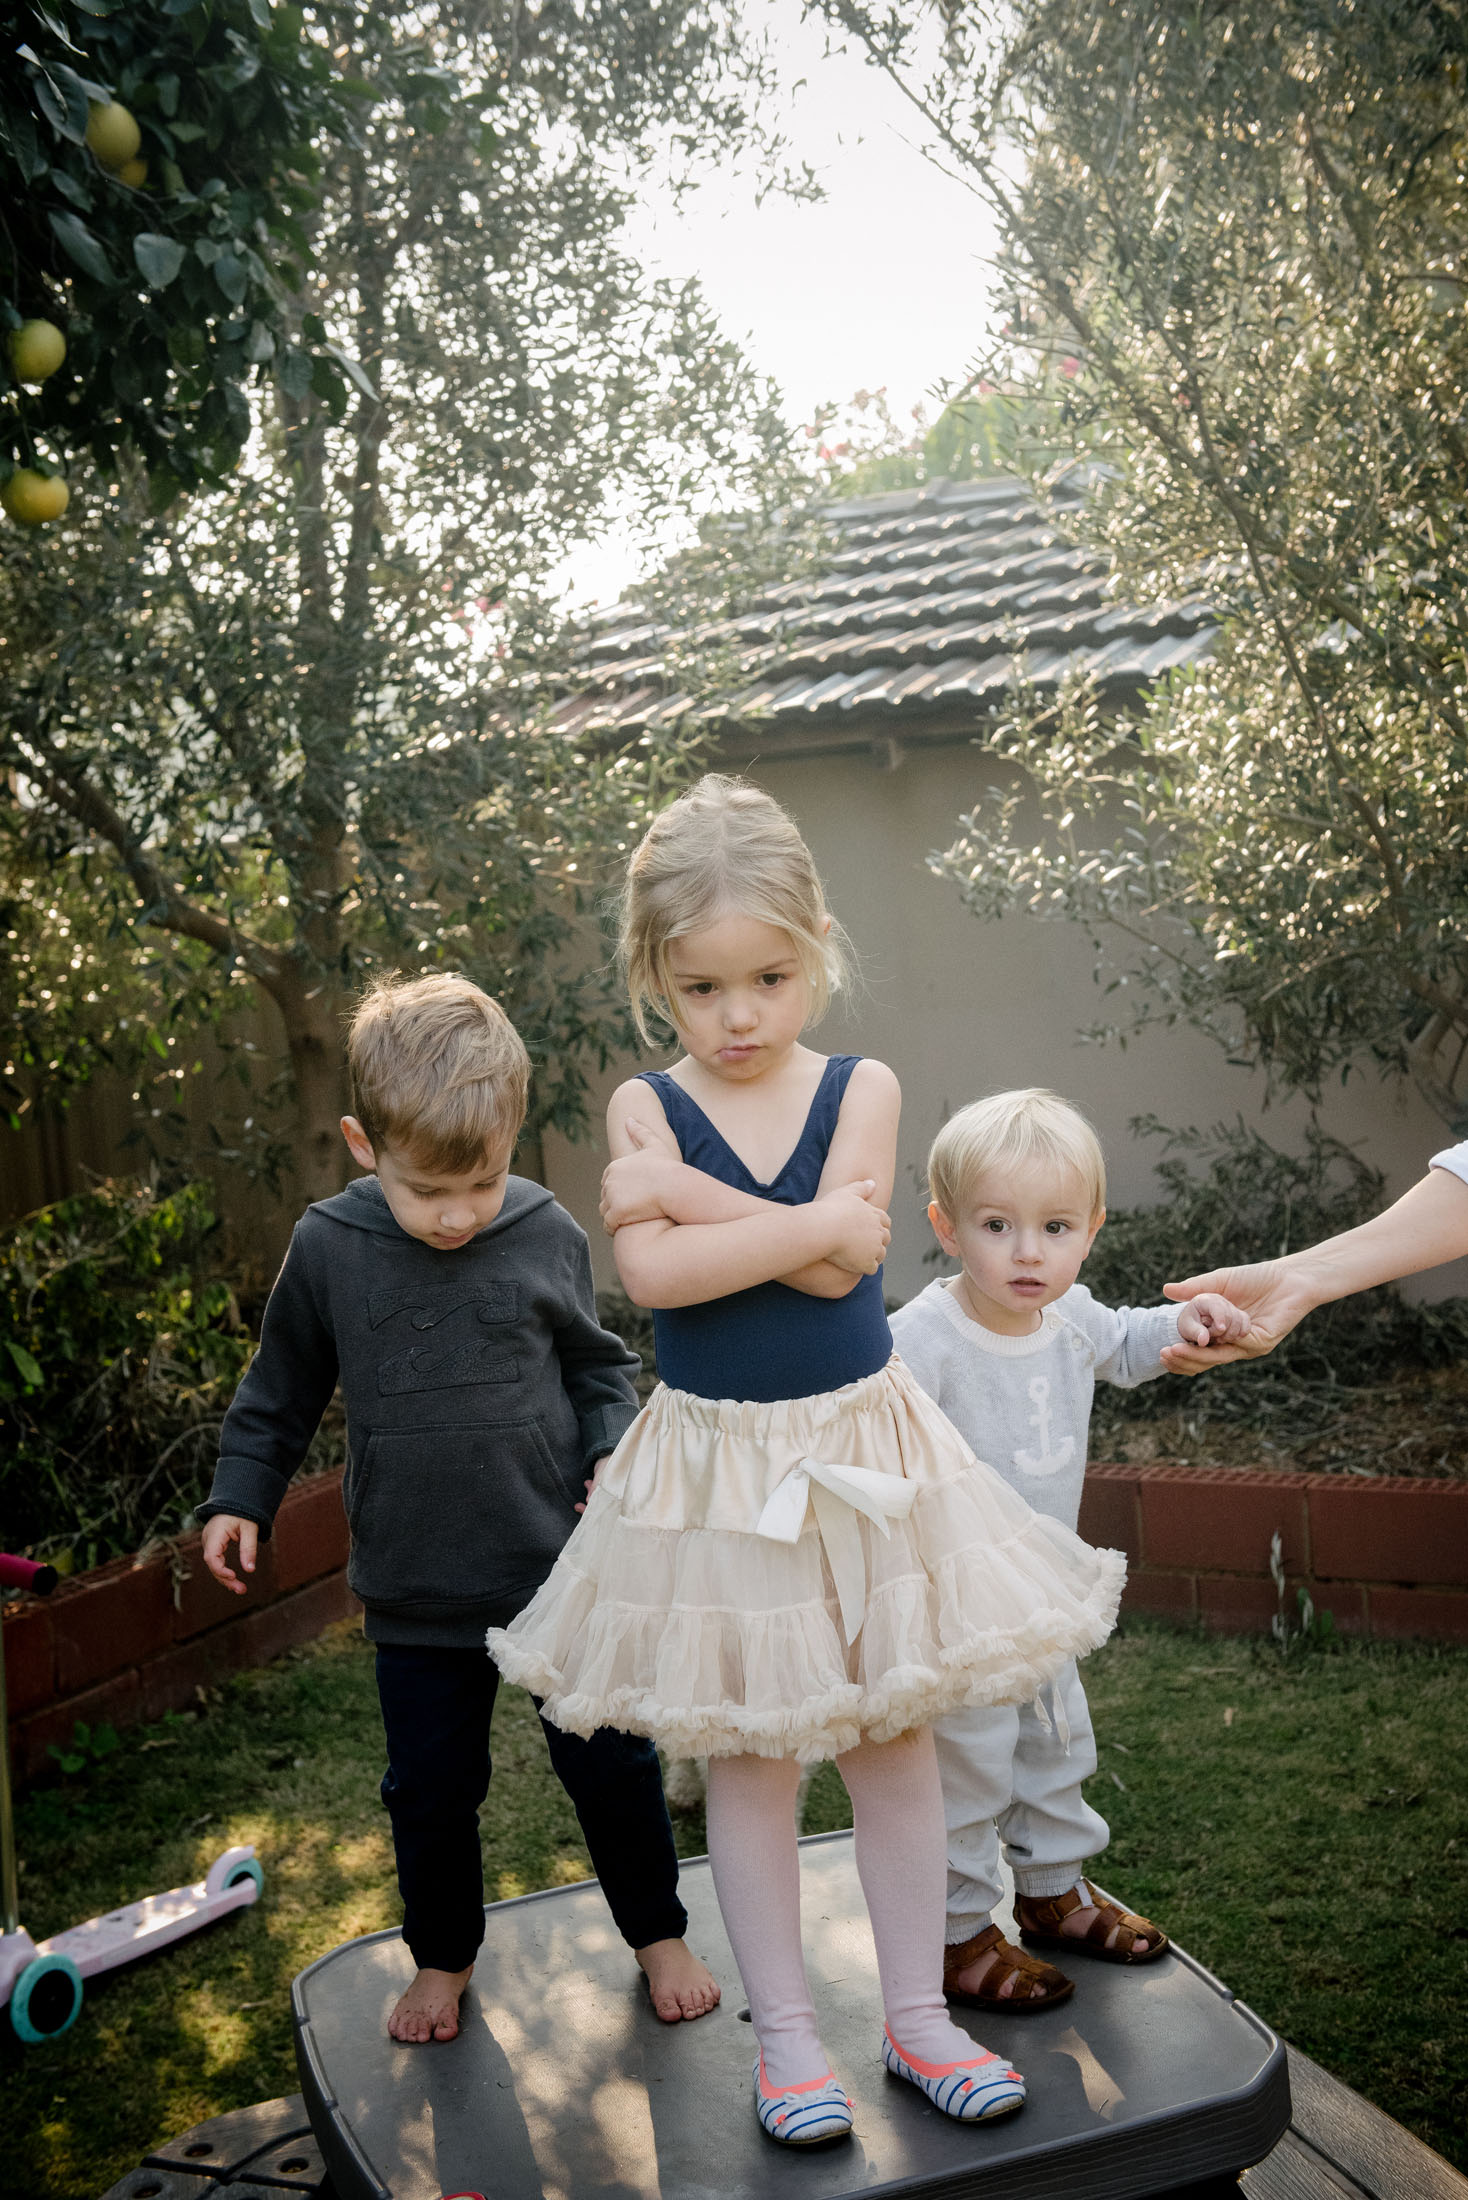 Laing_Family-Photography-unposed12.JPG